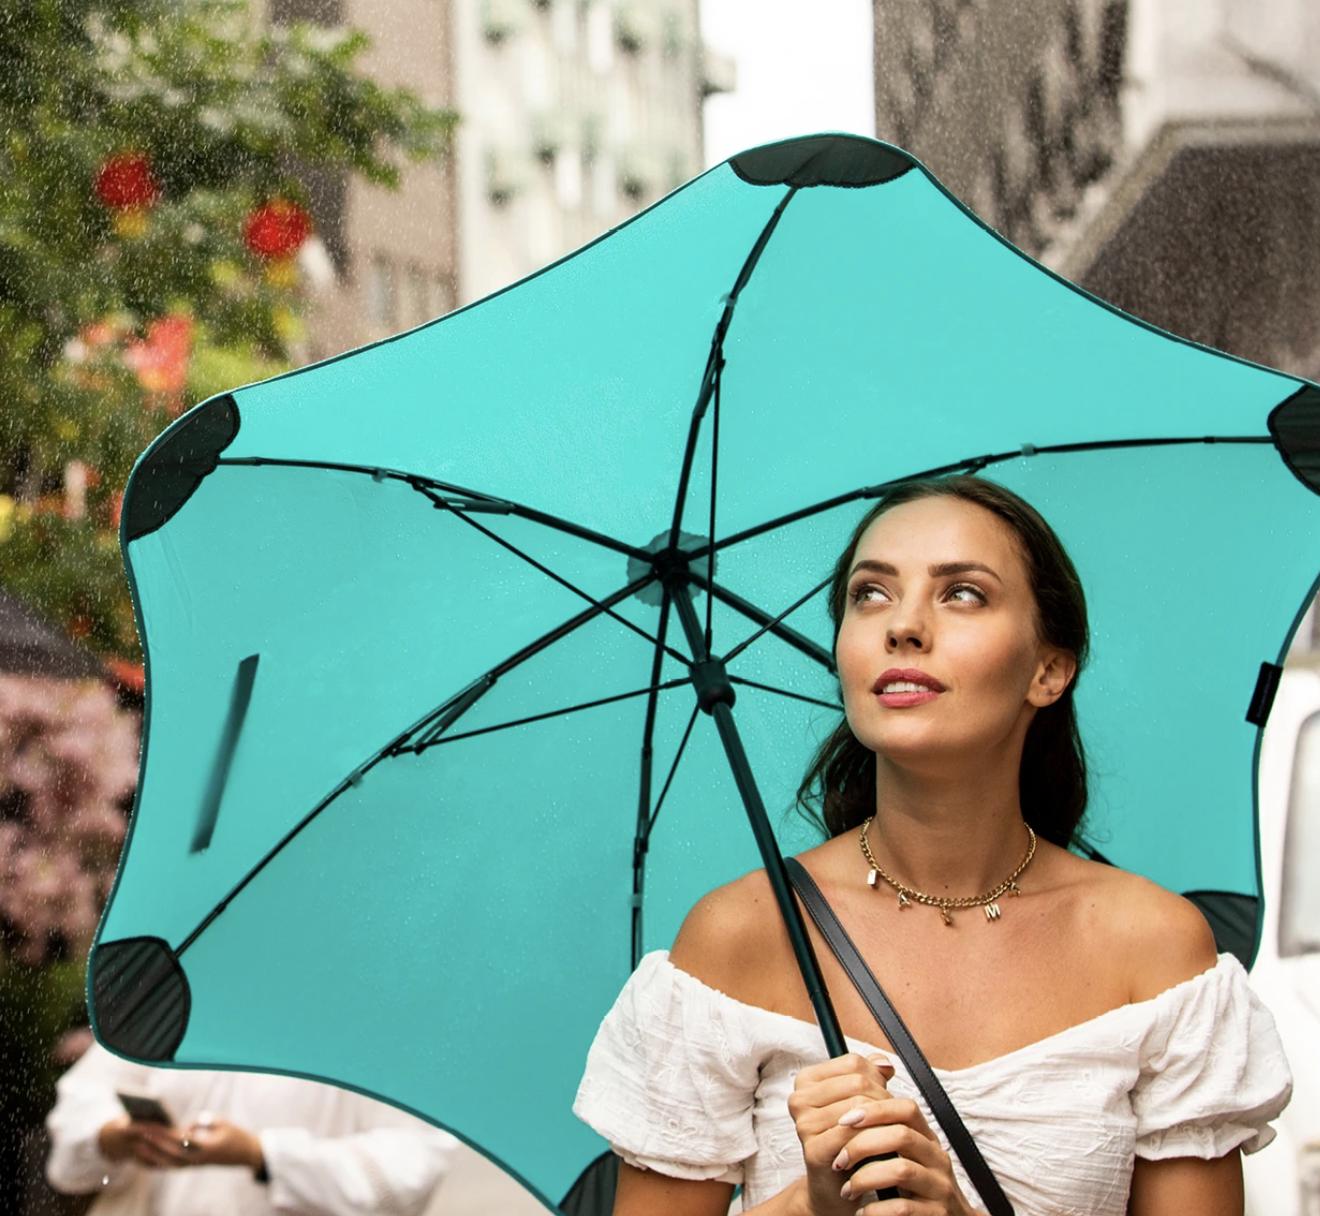 Onyapreneur: Introducing Greig Brebner From BLUNT Umbrellas